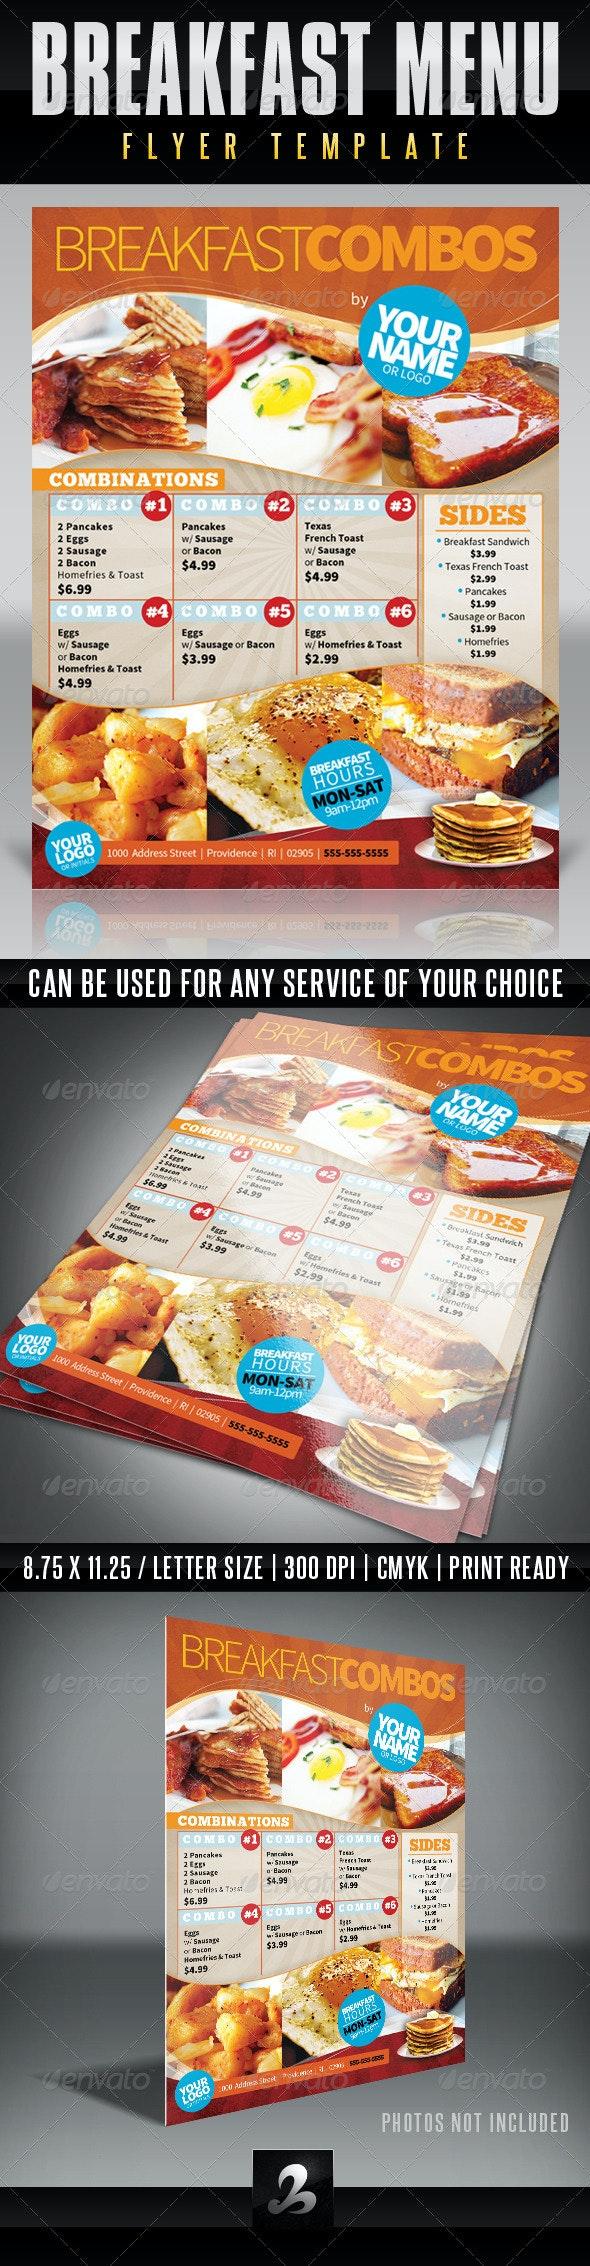 Menu Flyer Template - Breakfast - Food Menus Print Templates